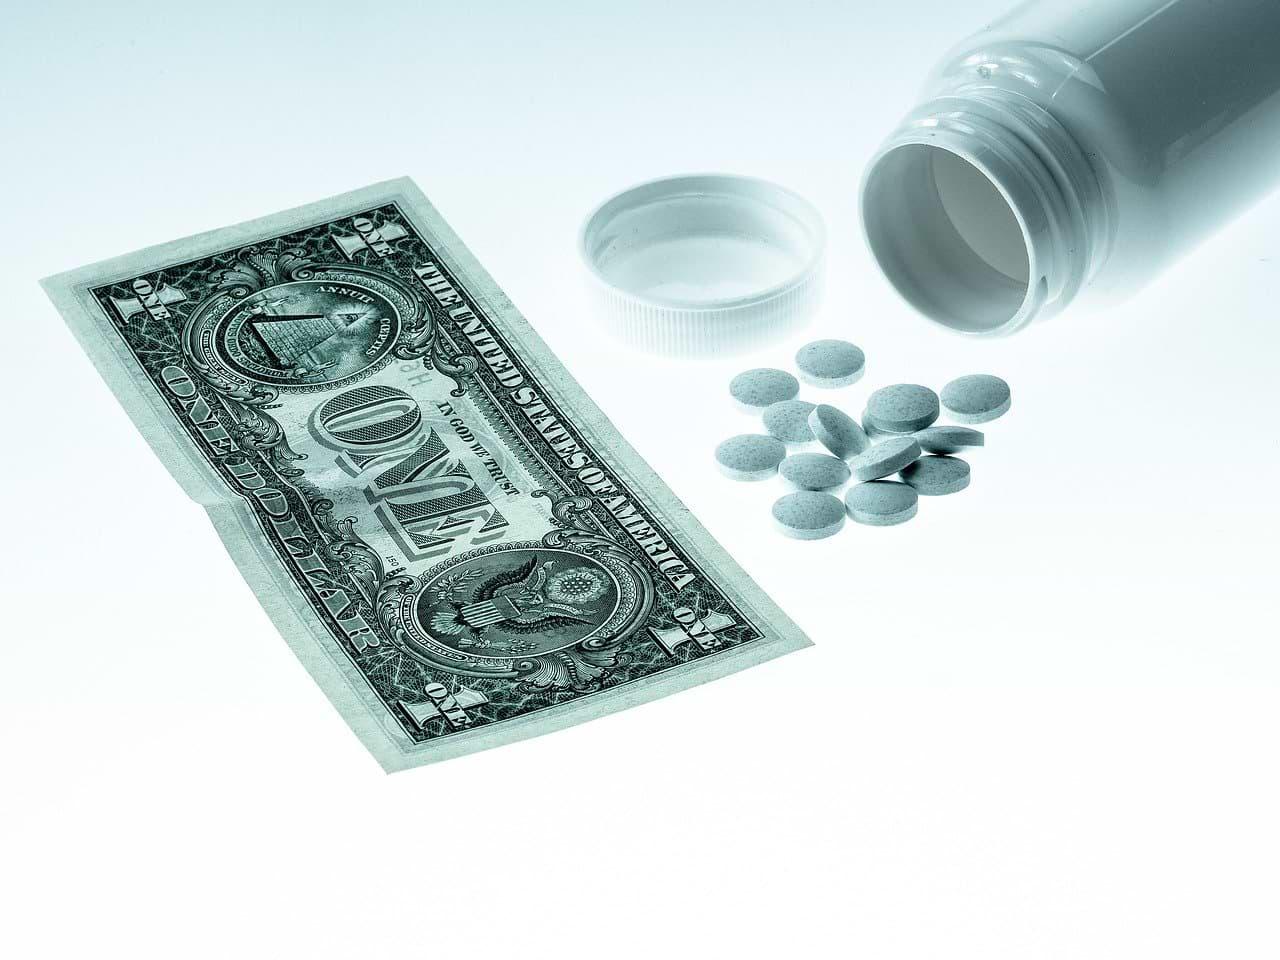 Medicing + ekonomi = sant